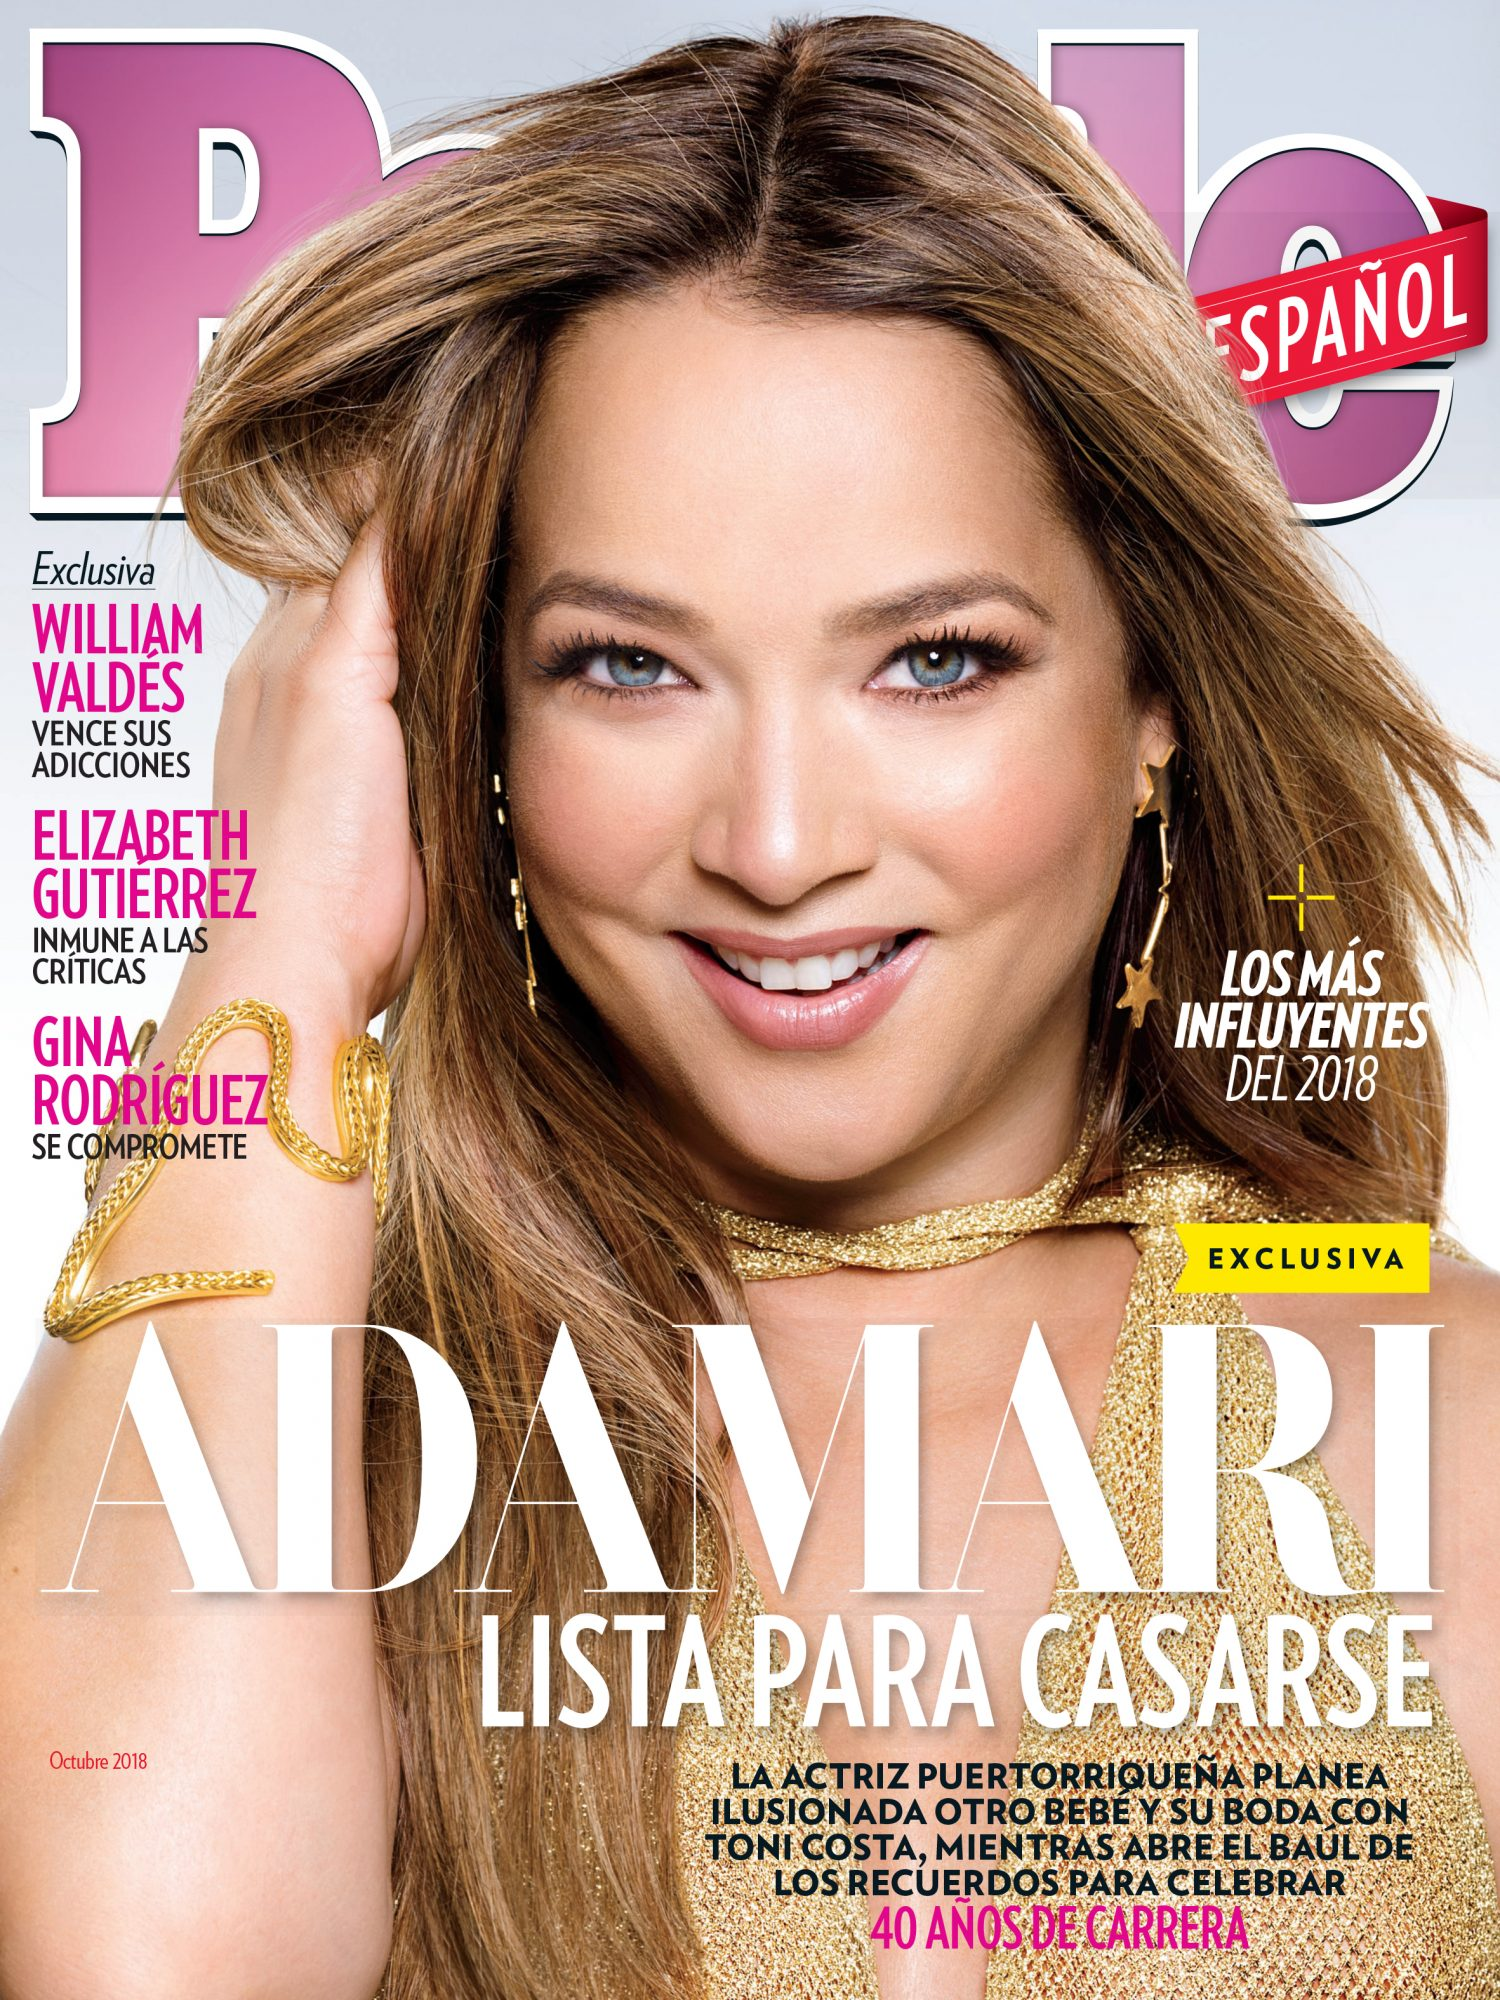 Adamari Lopez - Octubre 2018 Portada COVER